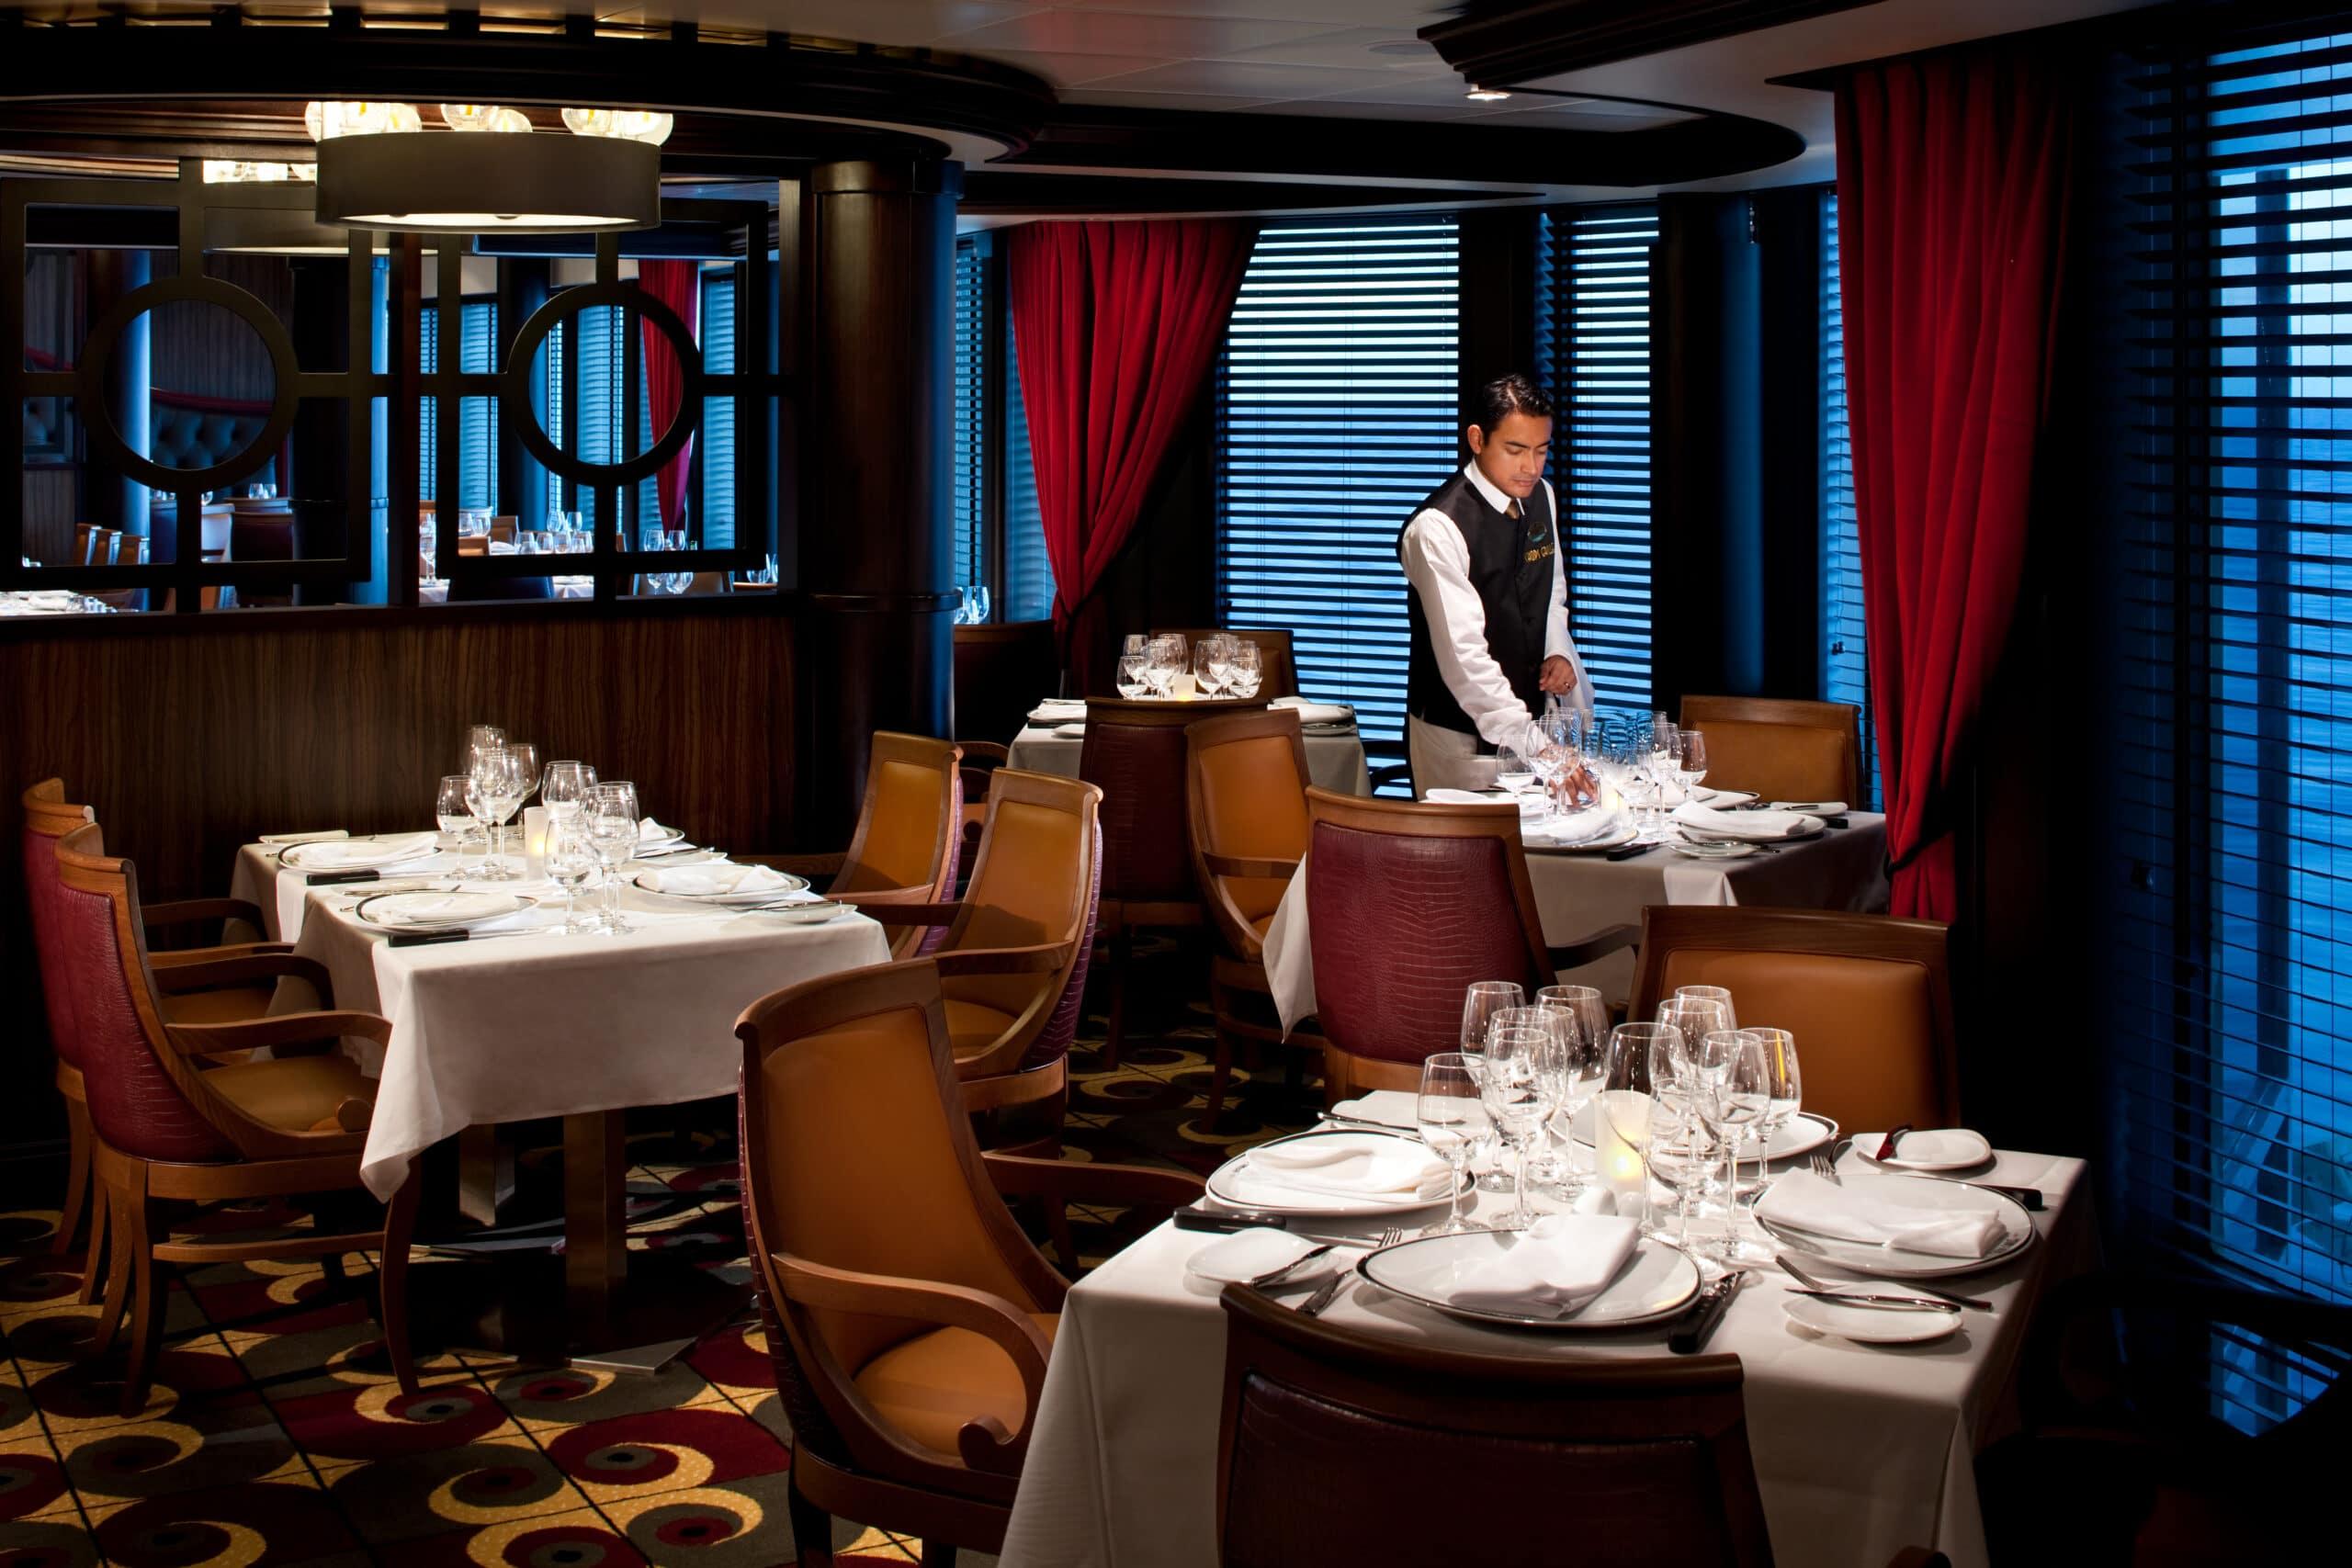 Royal-Caribbean-International-Chopsgrill-Specialiteiten-Restaurant